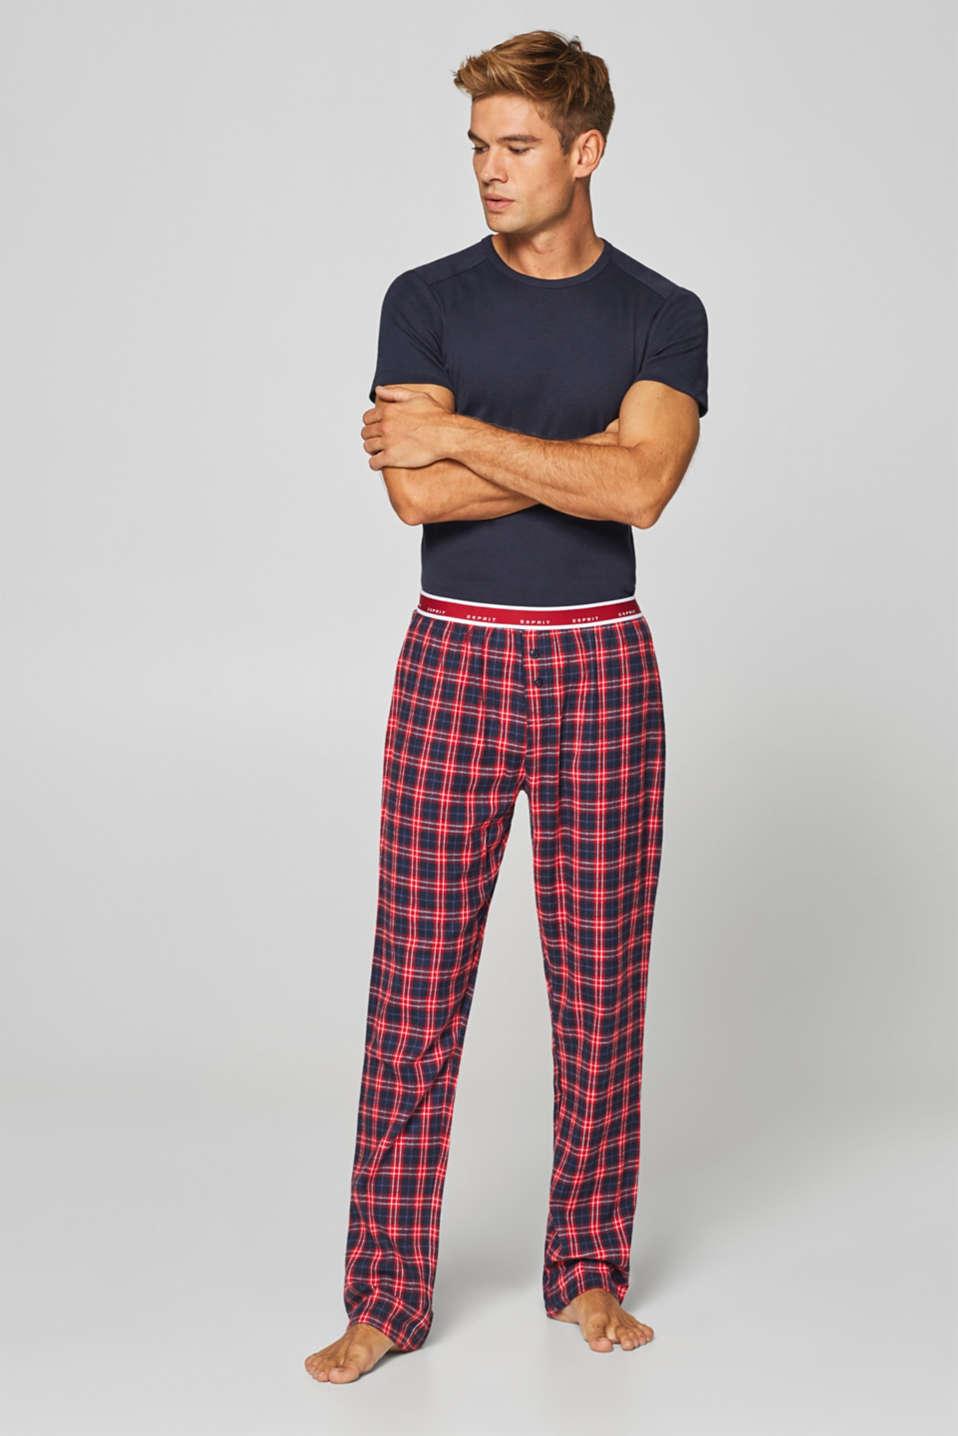 Pyjama Esprit